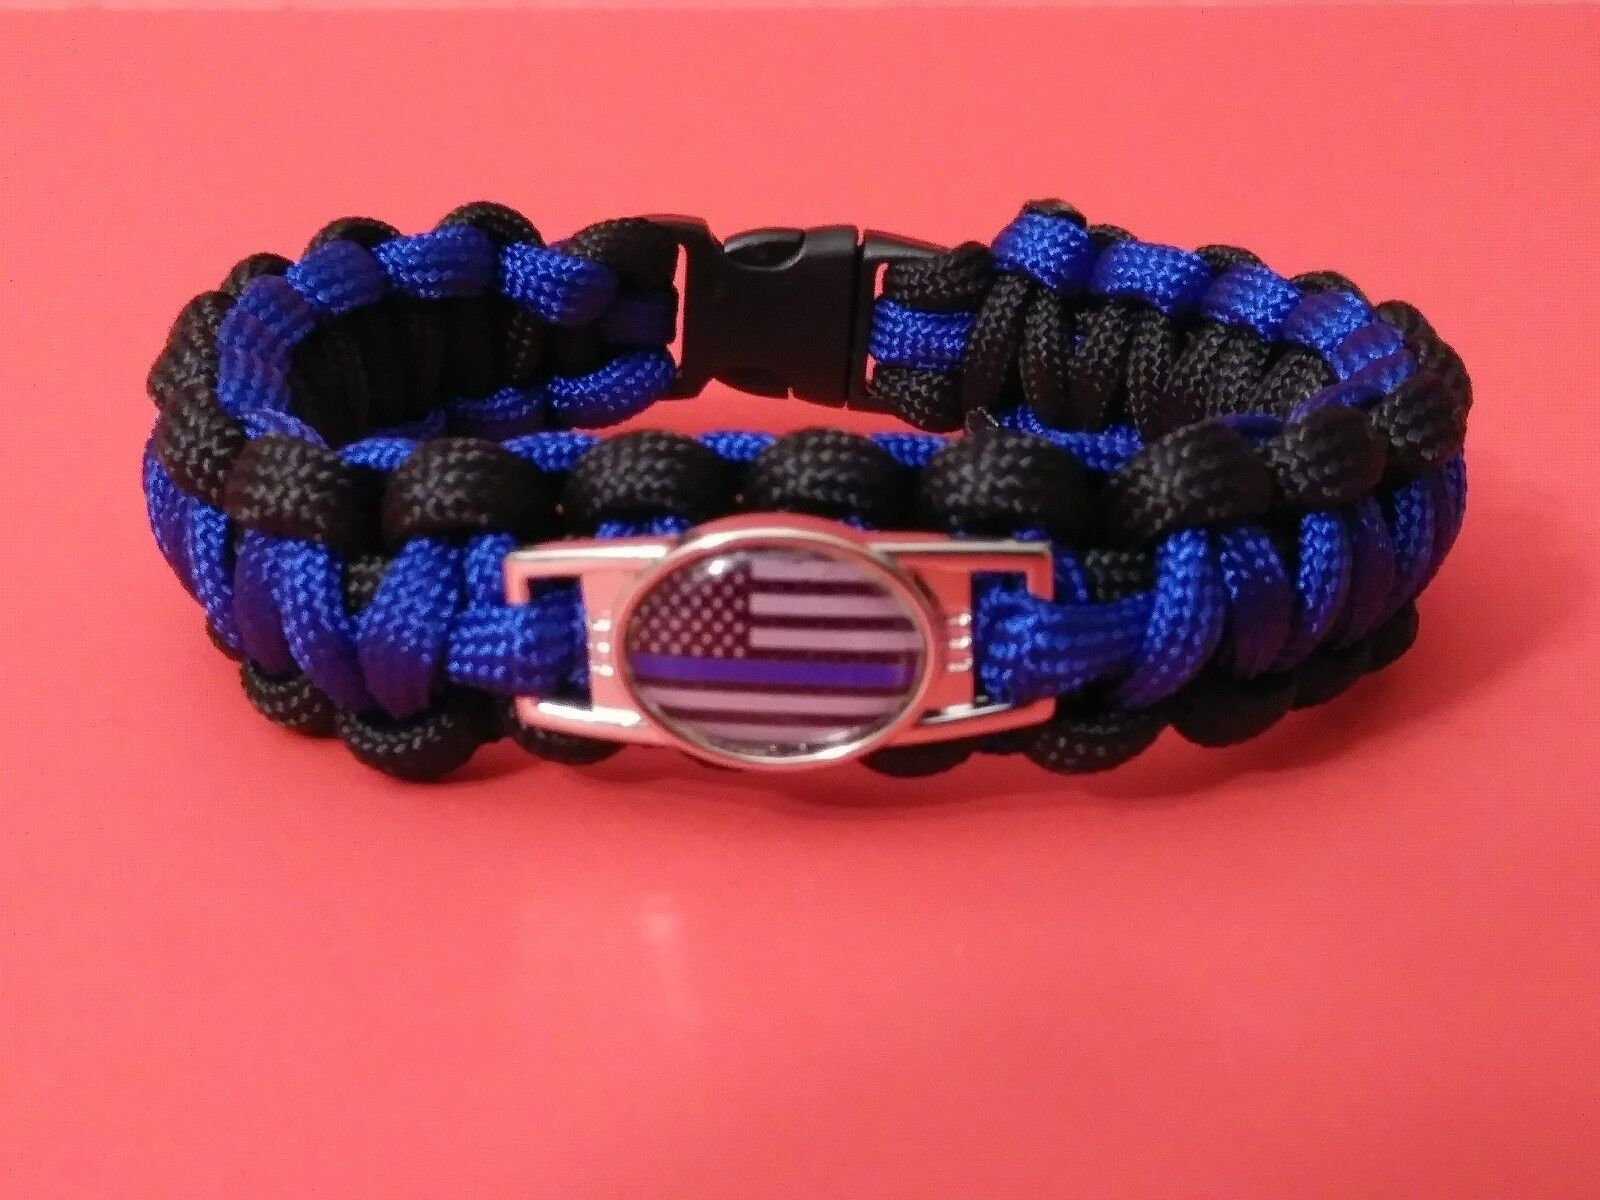 Thin Blue Line Paracord Bracelet Support Blue Lives Matter Wrist Band Police